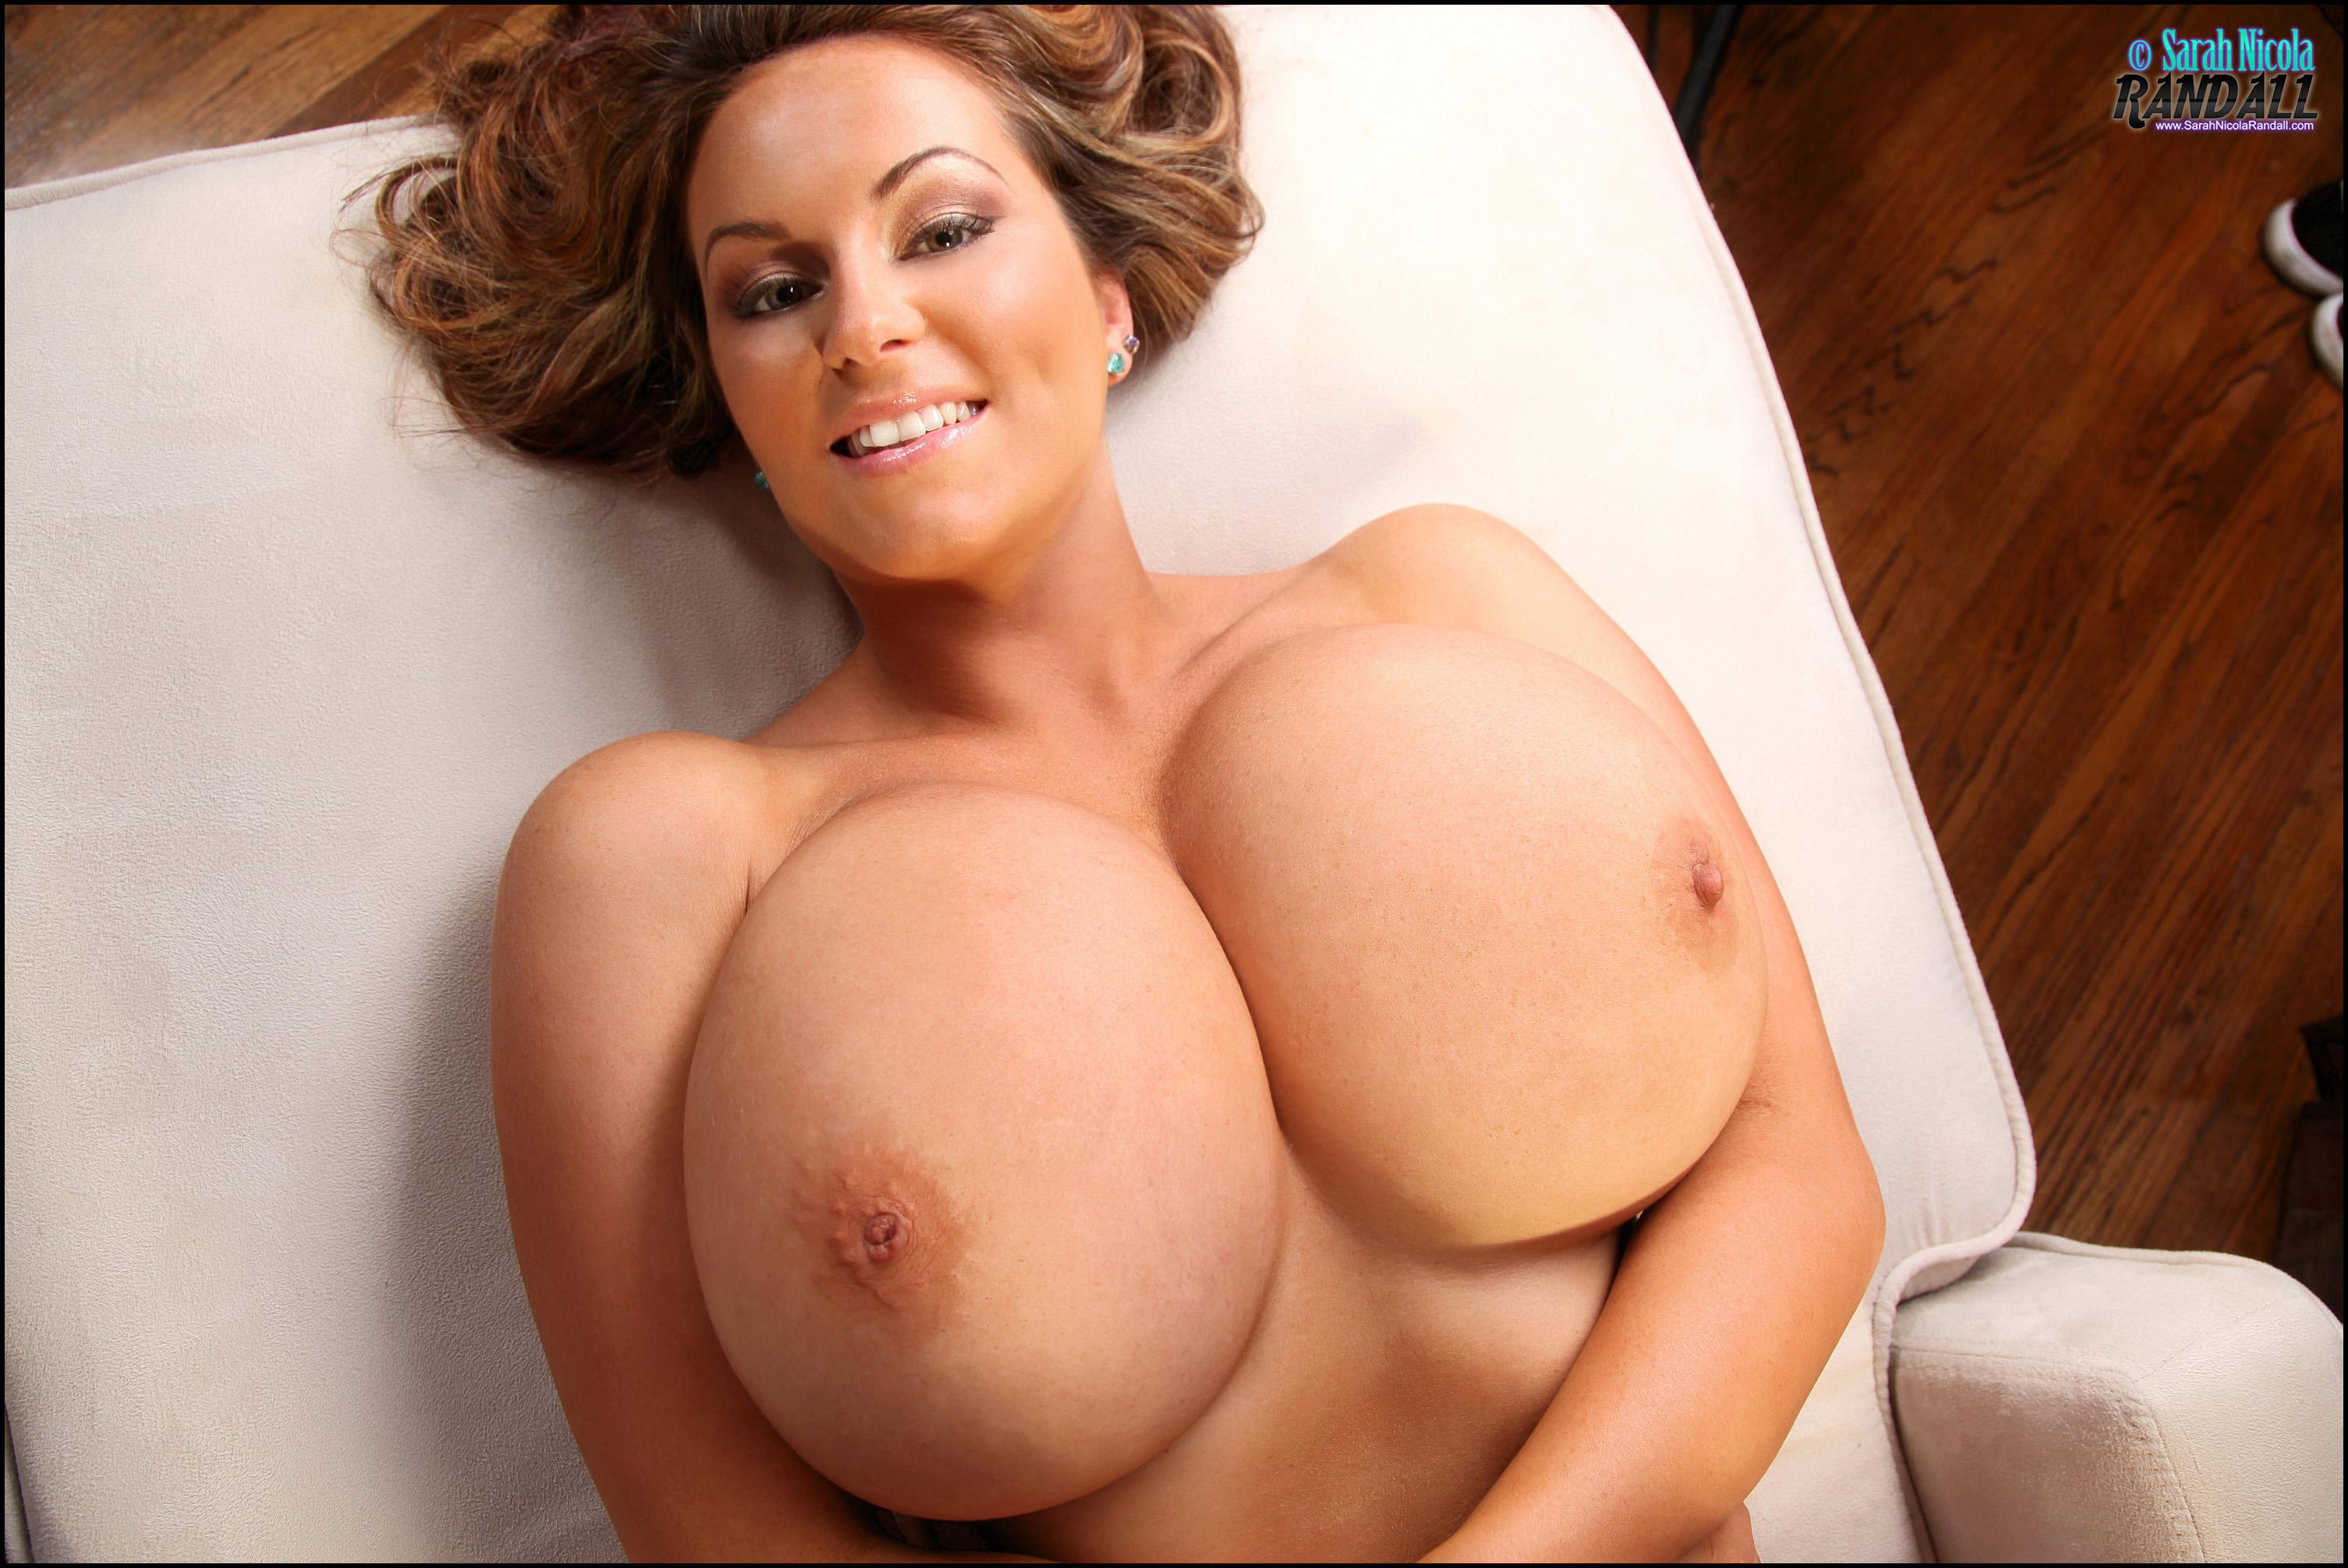 Sarah Nicola Randall Massive Tits and Lavender Panties